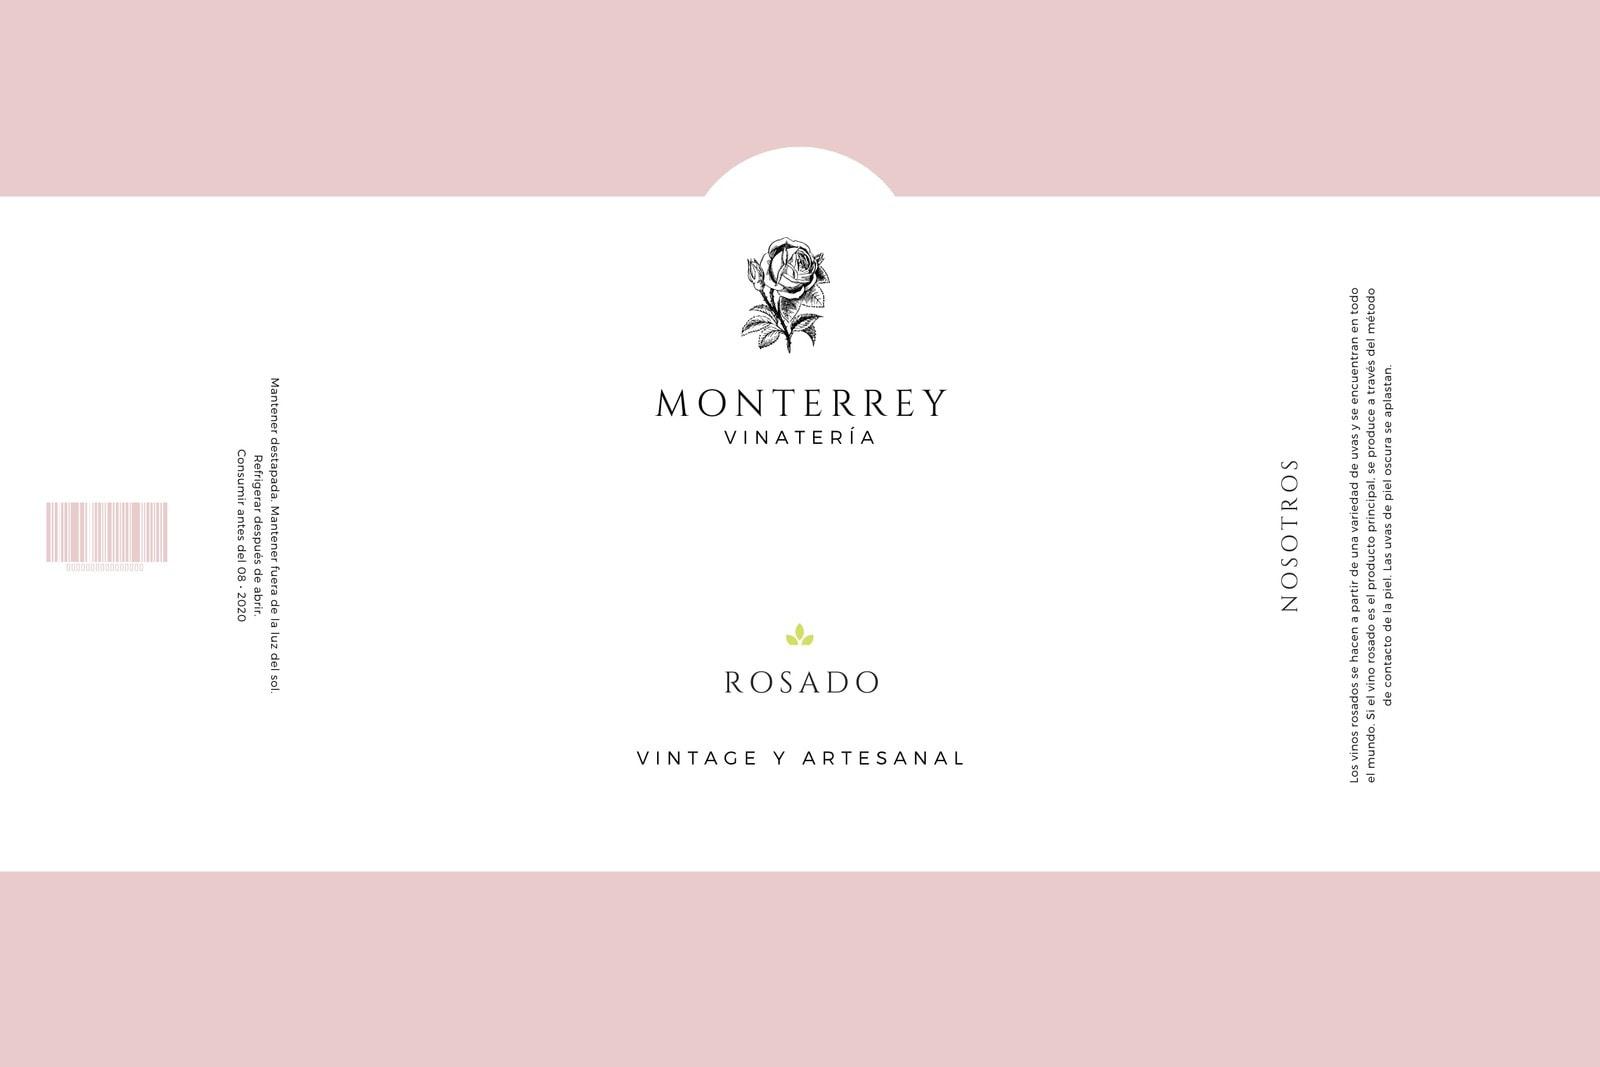 Rosa Claro y Blanco Minimalista Simple Elegante Botella de Vino Etiqueta